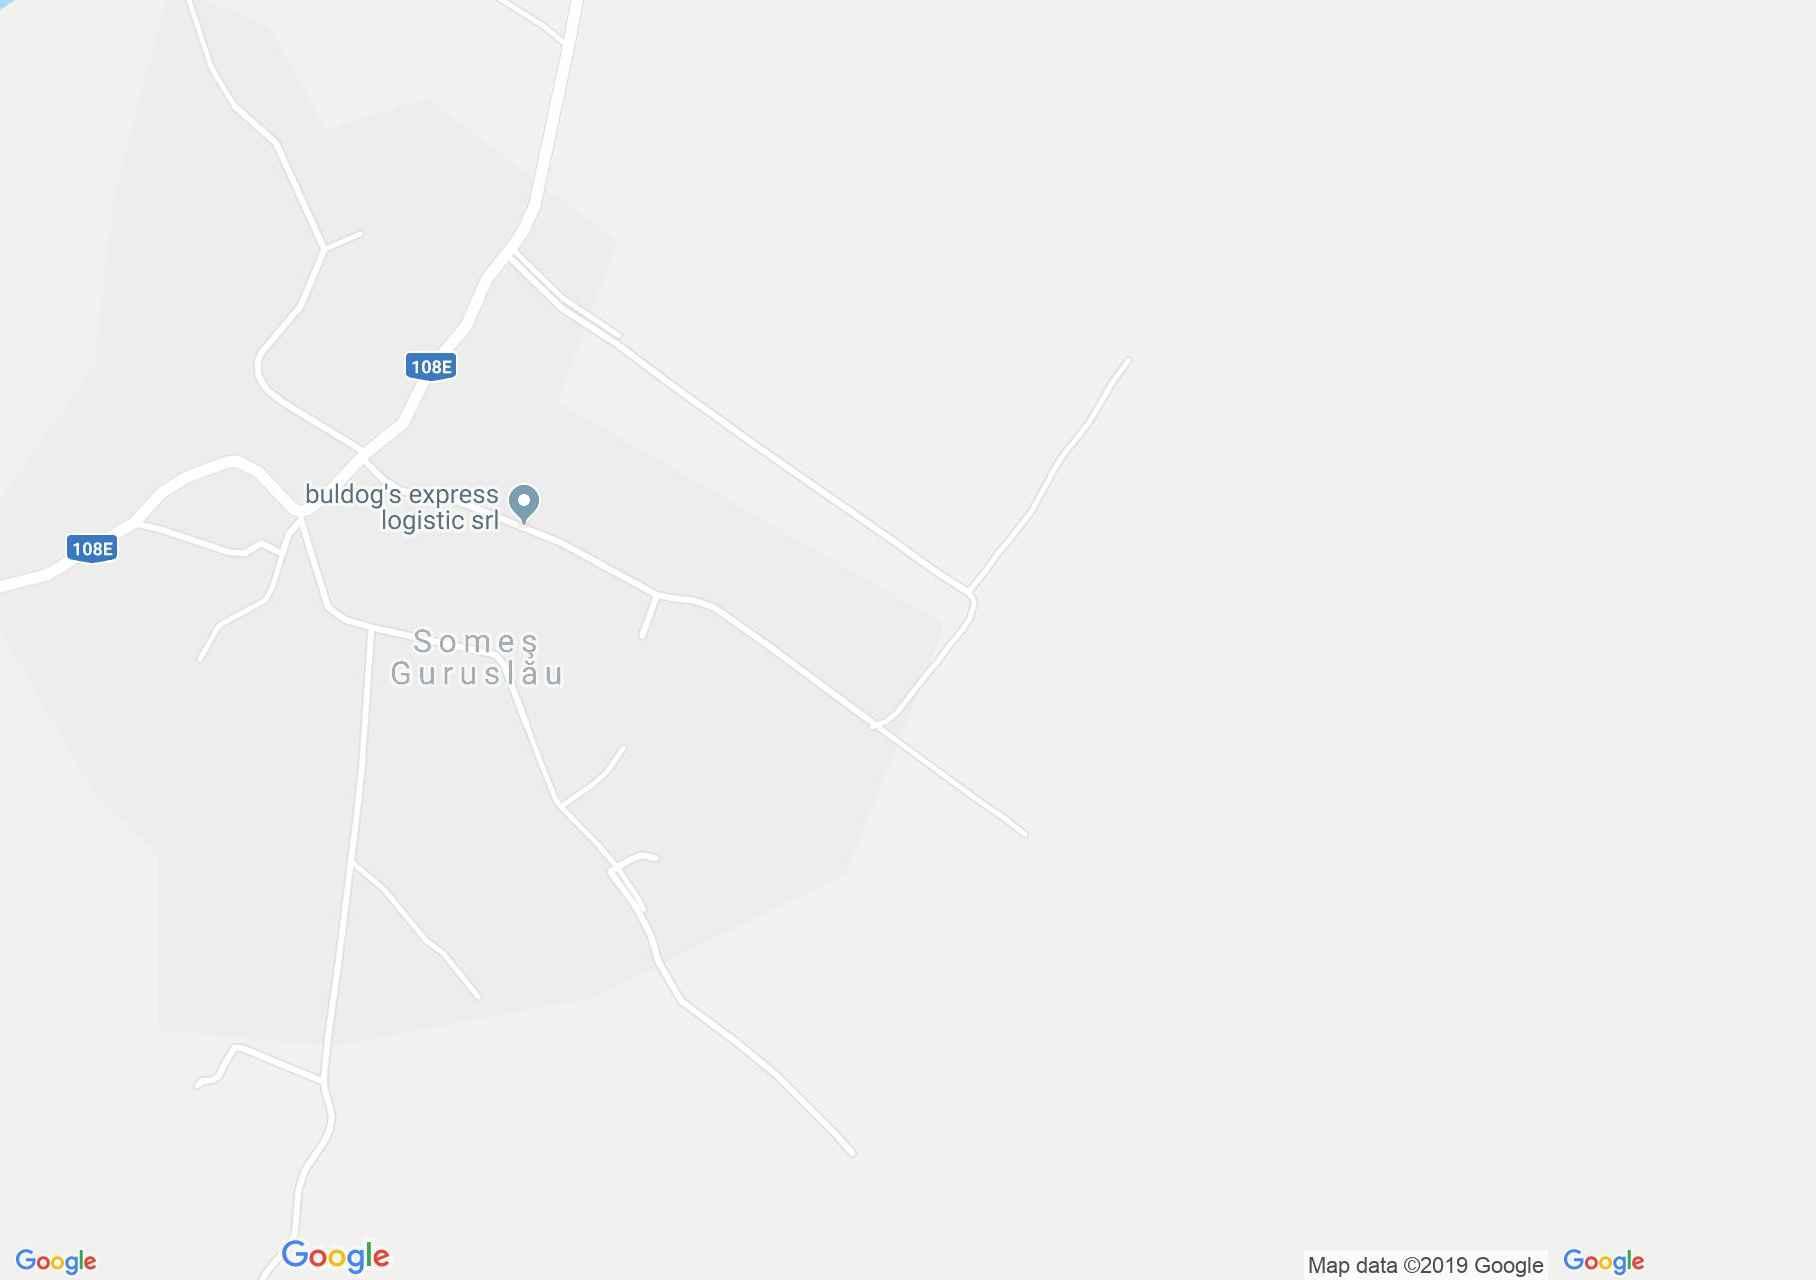 Map of Someş-Guruslău: Chestnut stand